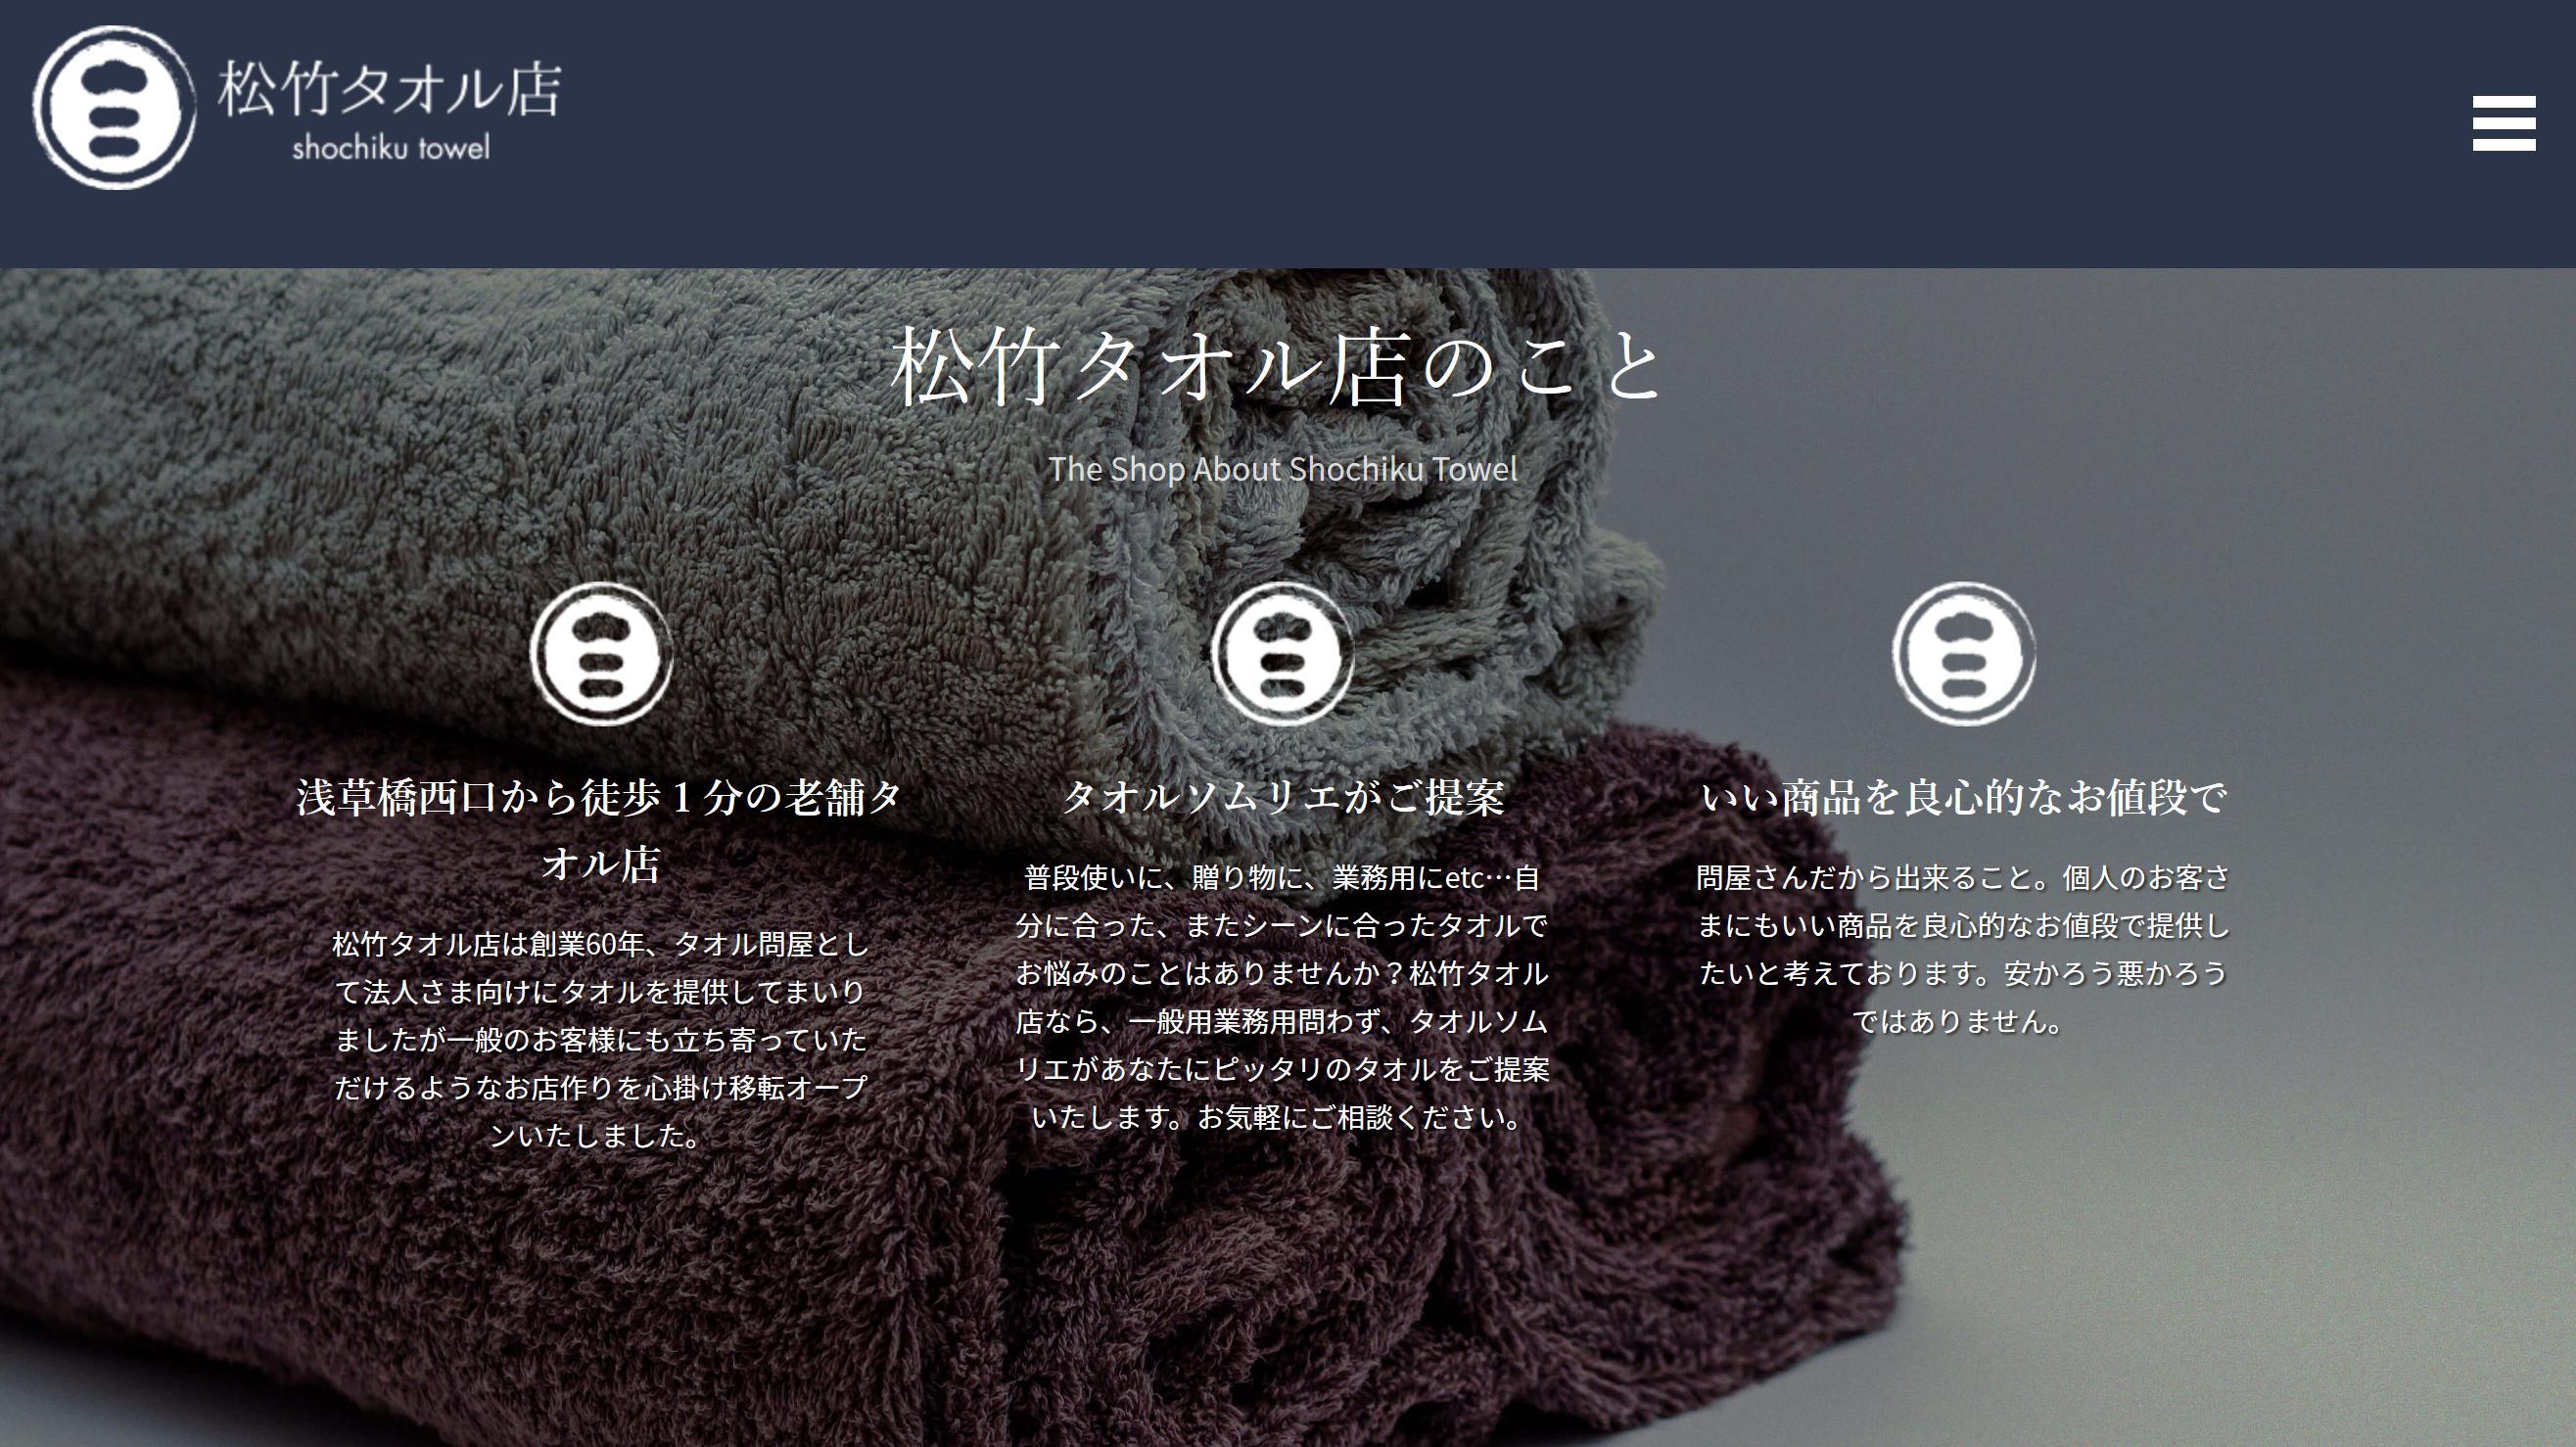 shochiku-towel.jp